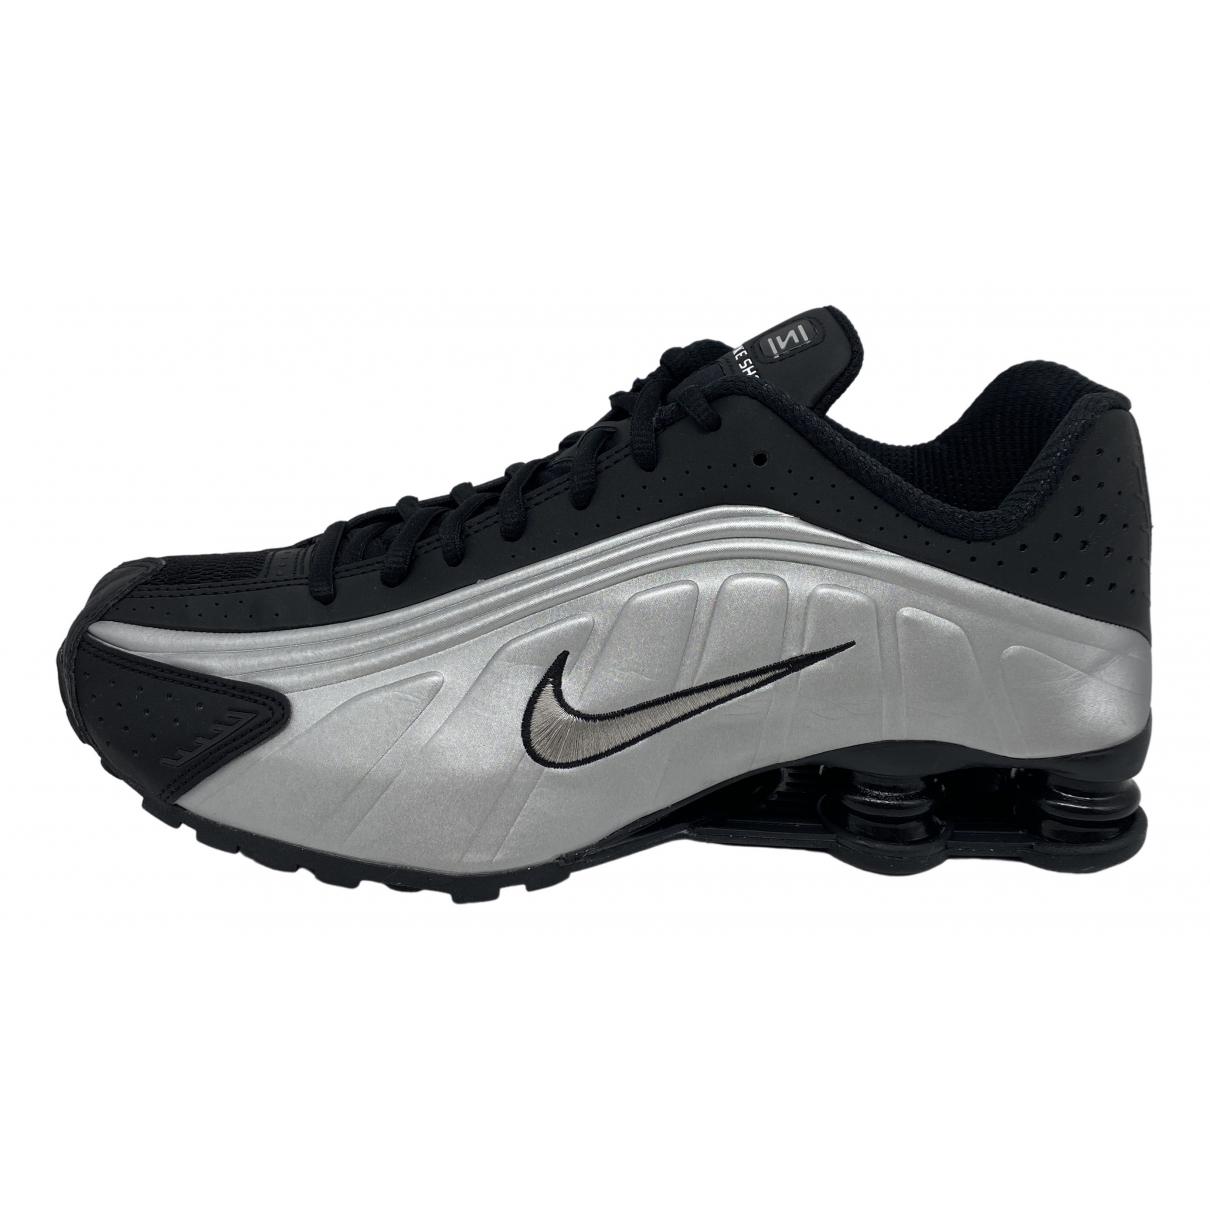 Deportivas Shox de Cuero Nike